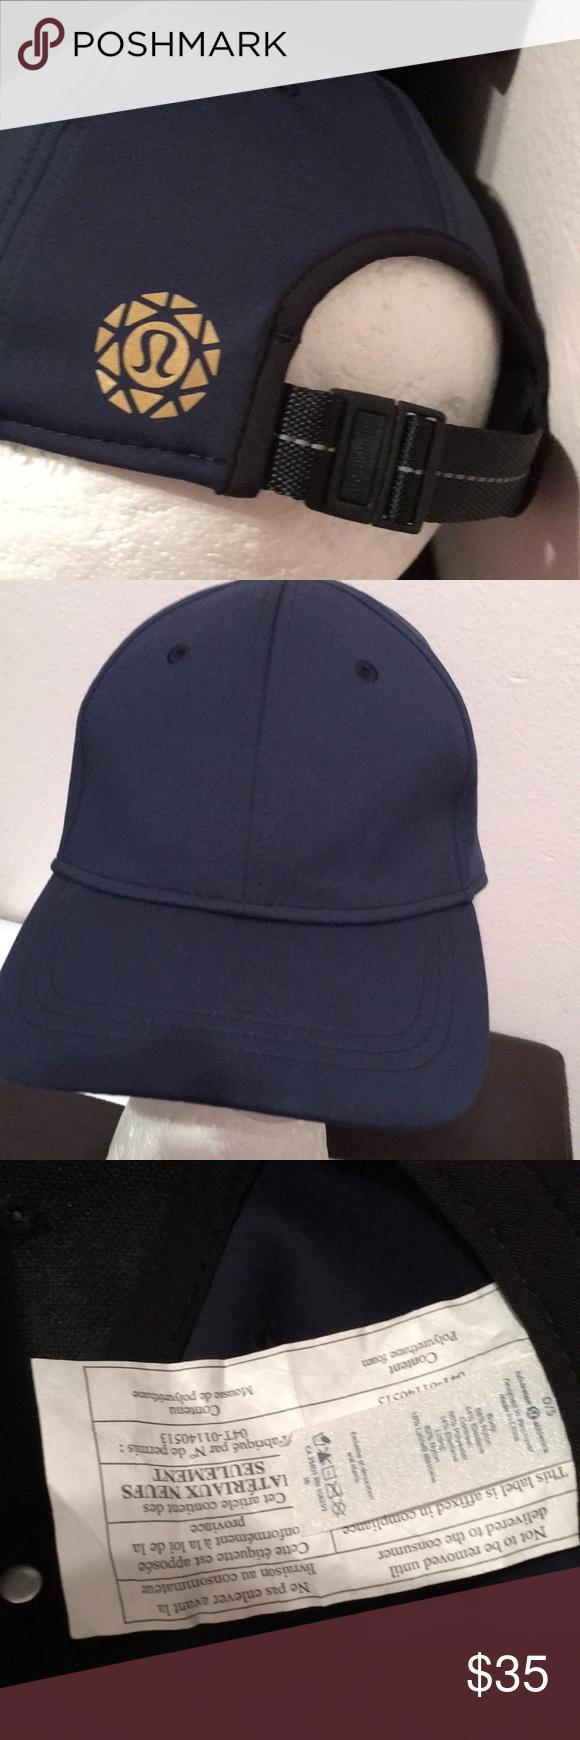 Lululemon cap 🧢 Like new condition unisex navy blue almost black 🧢  lululemon athletica Accessories Hats 1004496f2ff